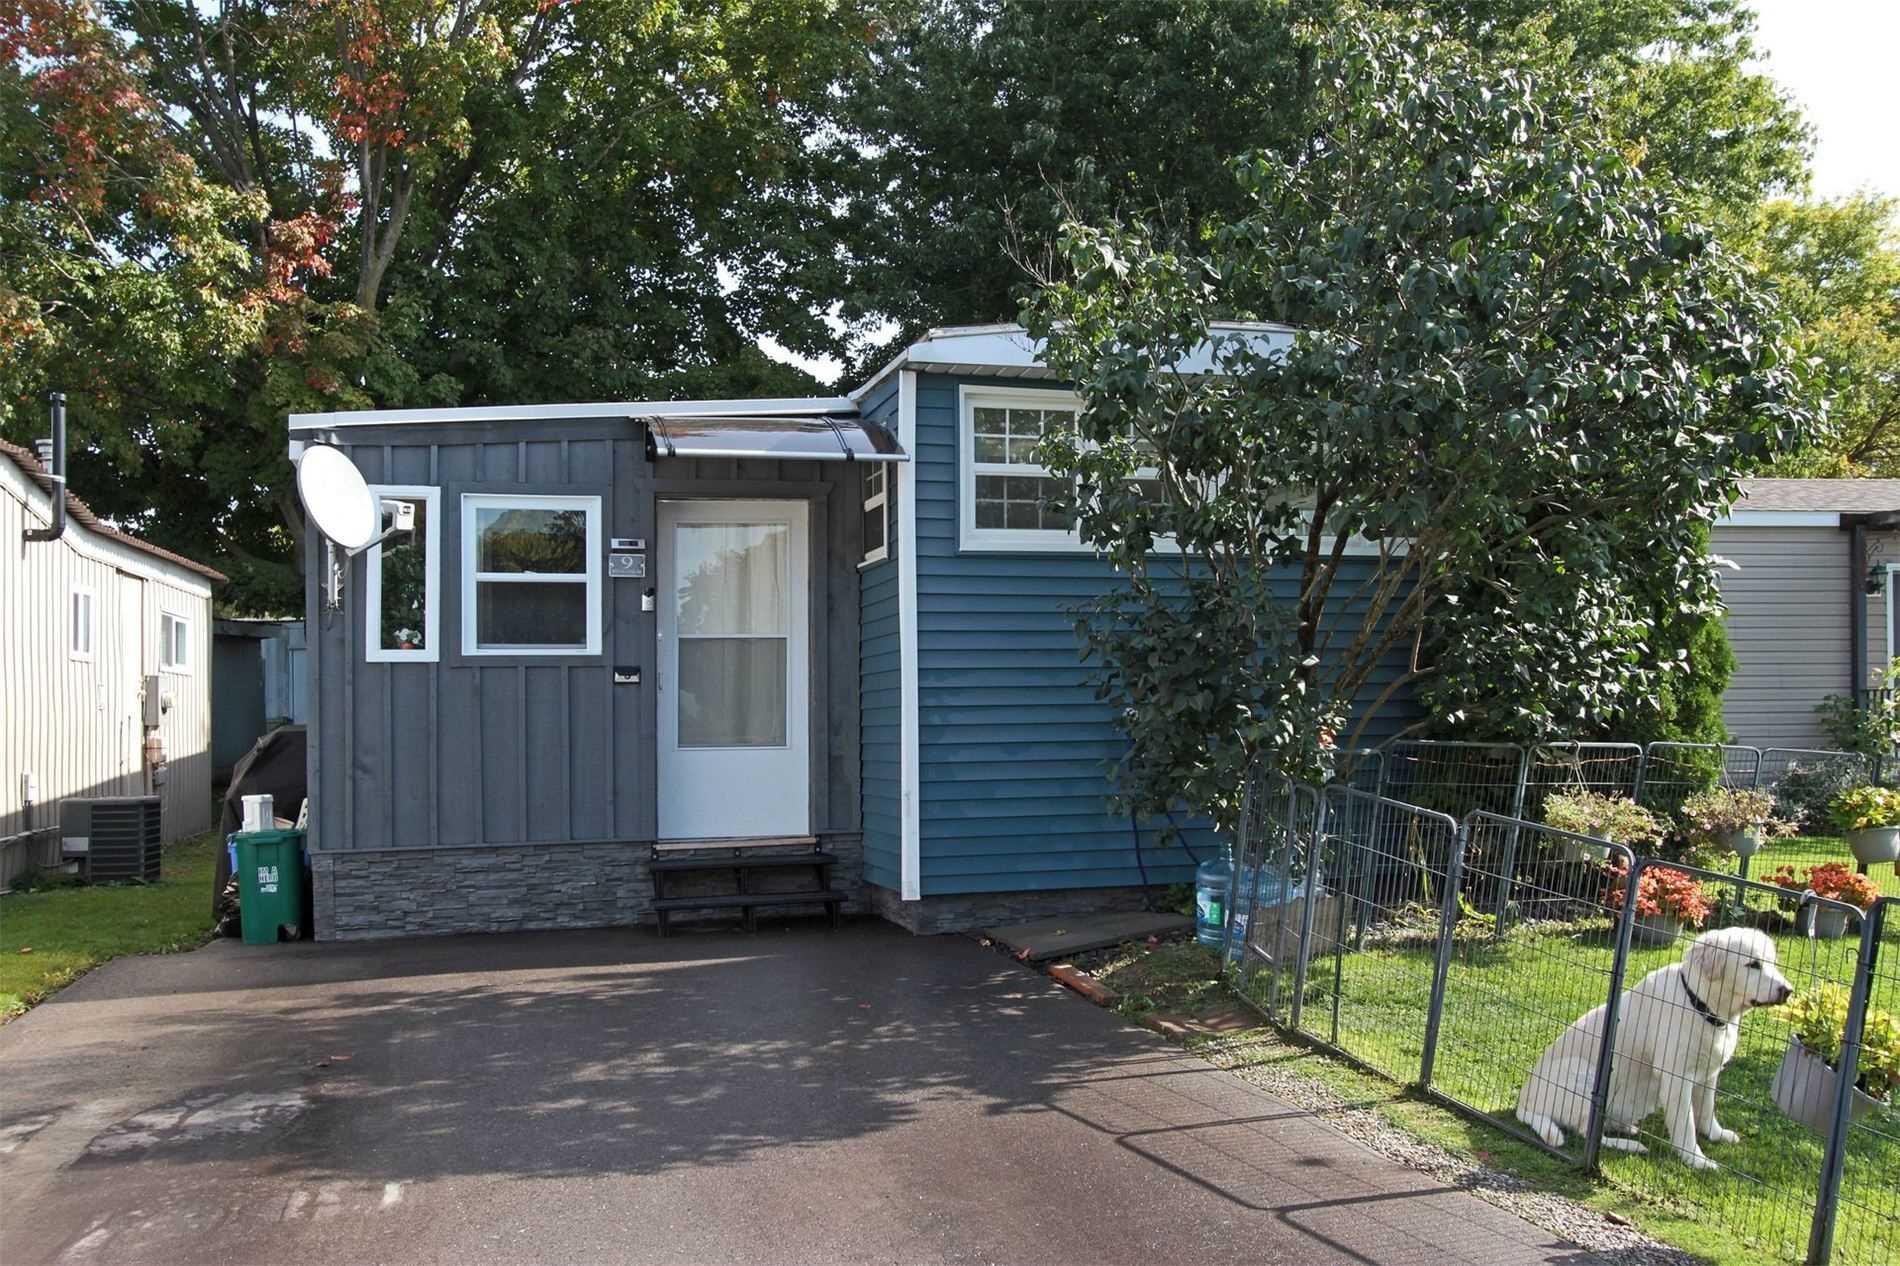 Mobile/trailer For Sale In Innisfil , 2 Bedrooms Bedrooms, ,1 BathroomBathrooms,Mobile/trailer,For Sale,Royal Oak